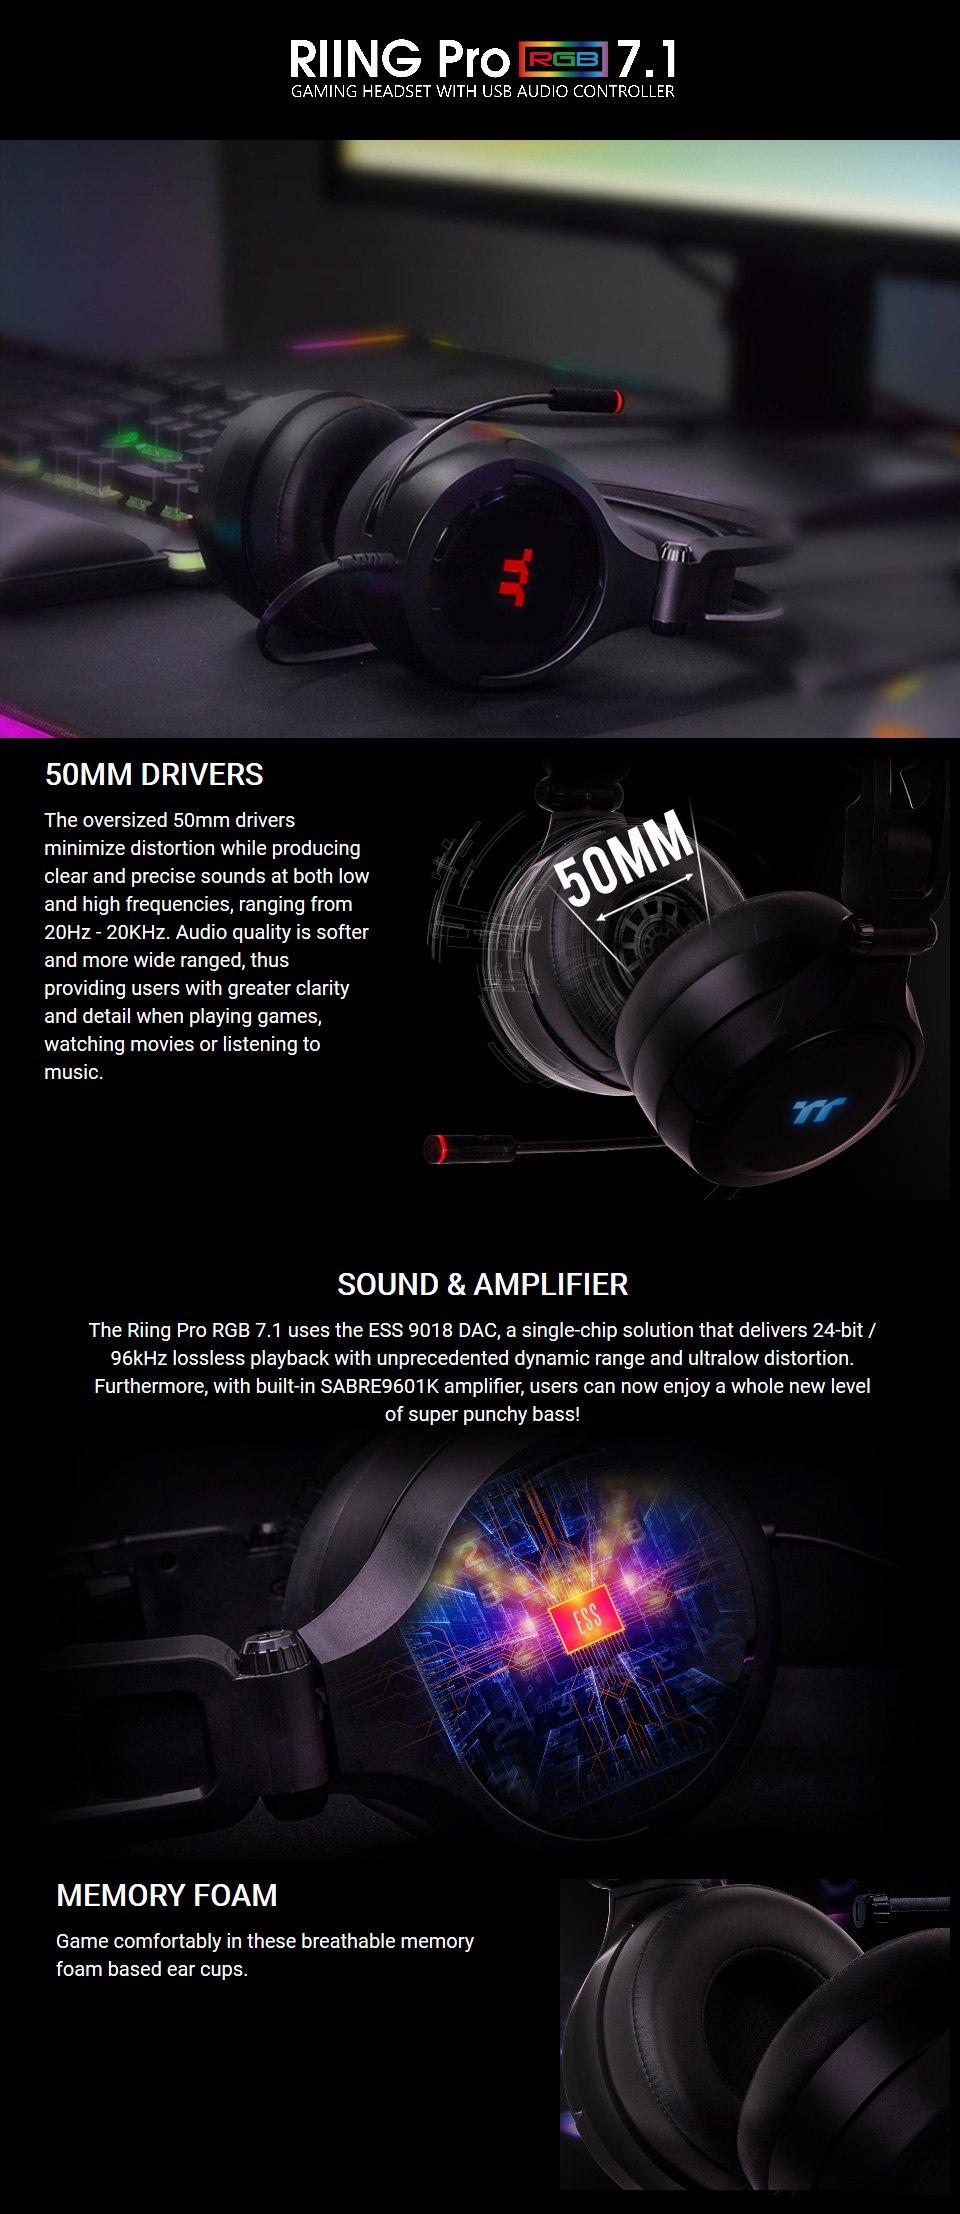 Thermaltake RIING Pro RGB 7.1 Surround Gaming Headset features